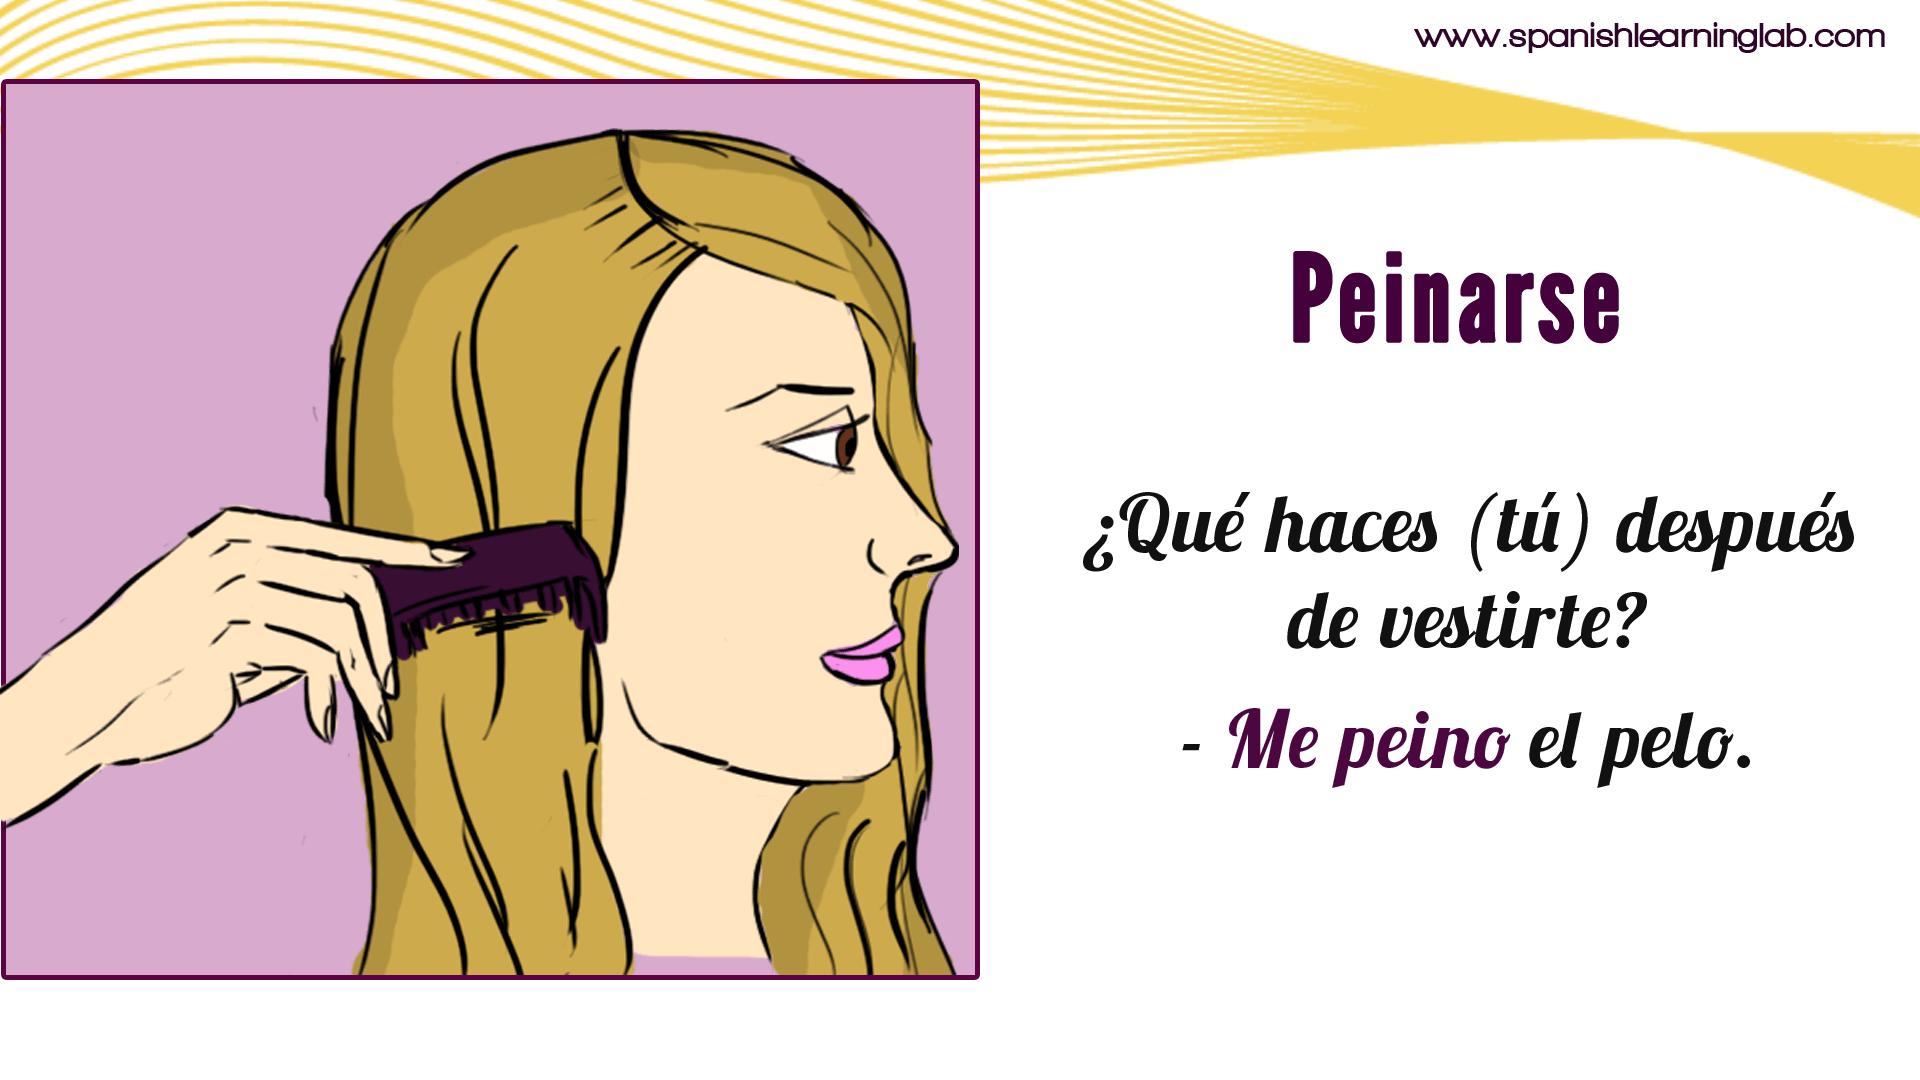 How To Conjugate A Spanish Reflexive Verb Like Peinarse It Should Be Like This Yo Me Peino Tu Te Peinas El Learning Spanish Daily Routine Spanish [ 1080 x 1920 Pixel ]